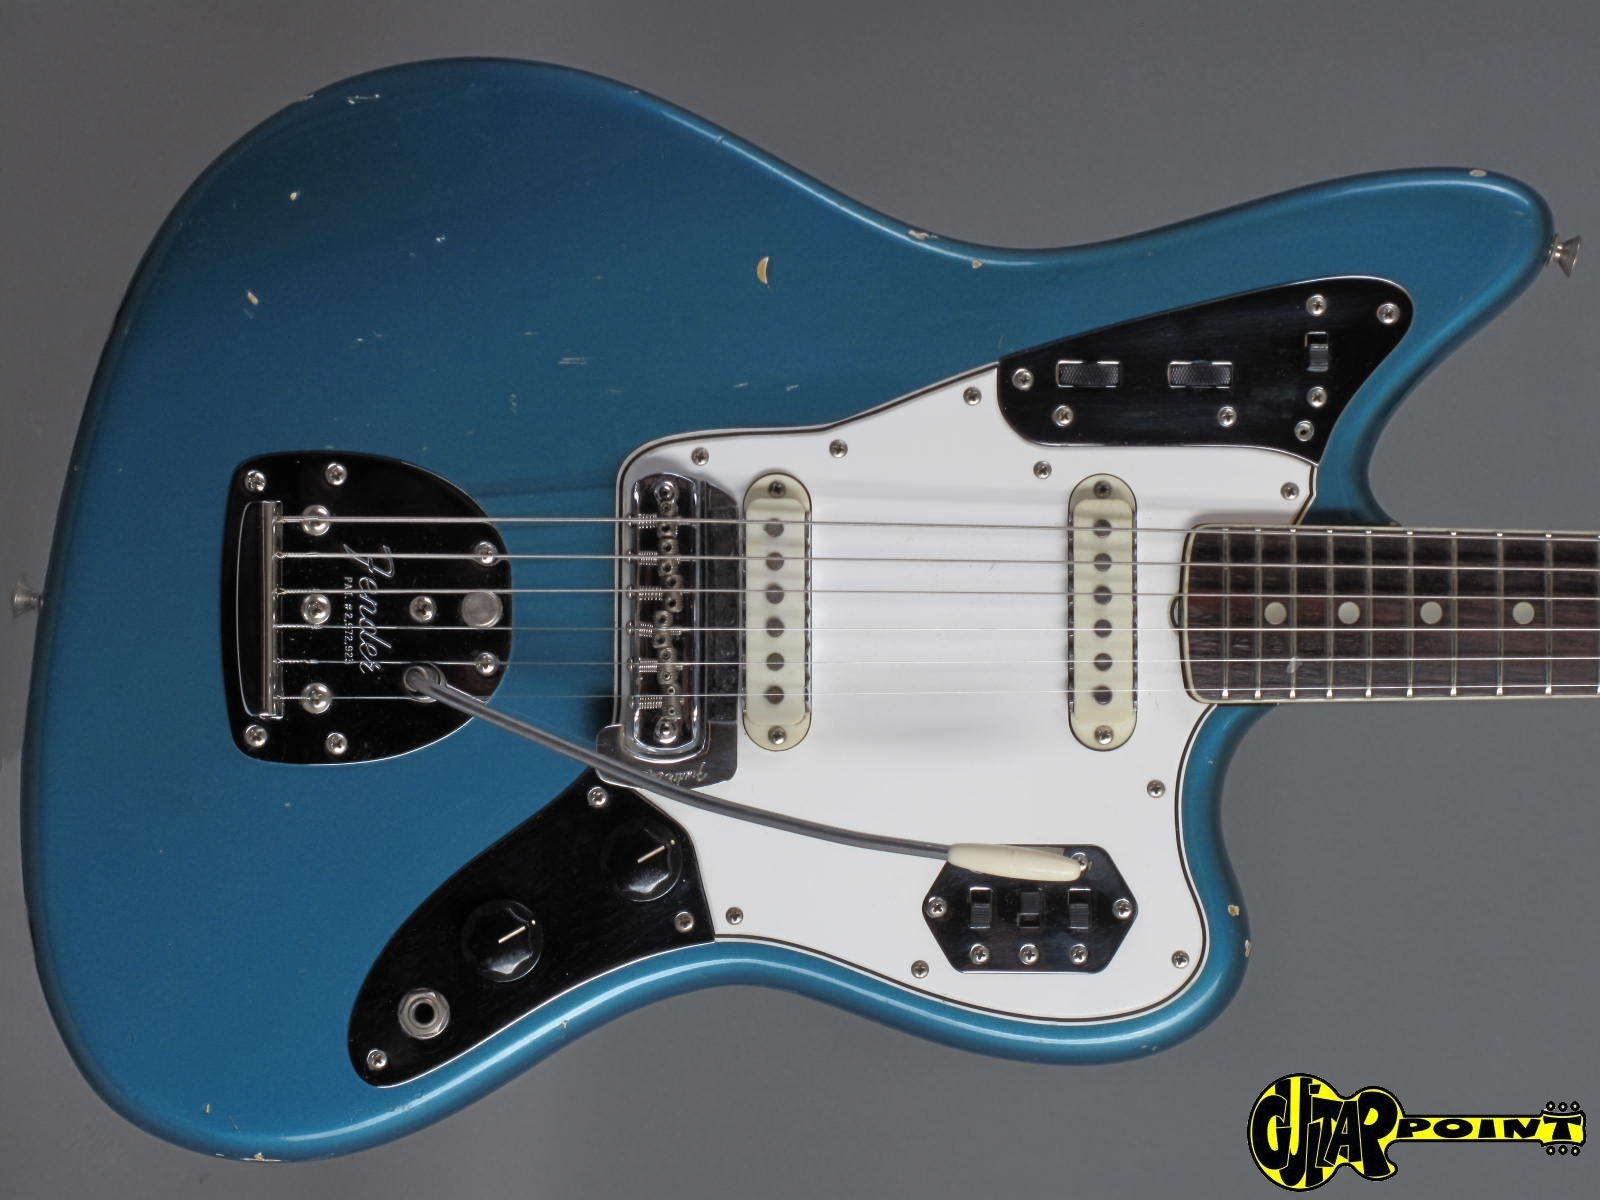 us en electric cobain gtr guitars jaguar fender kurt nr cntbdyright